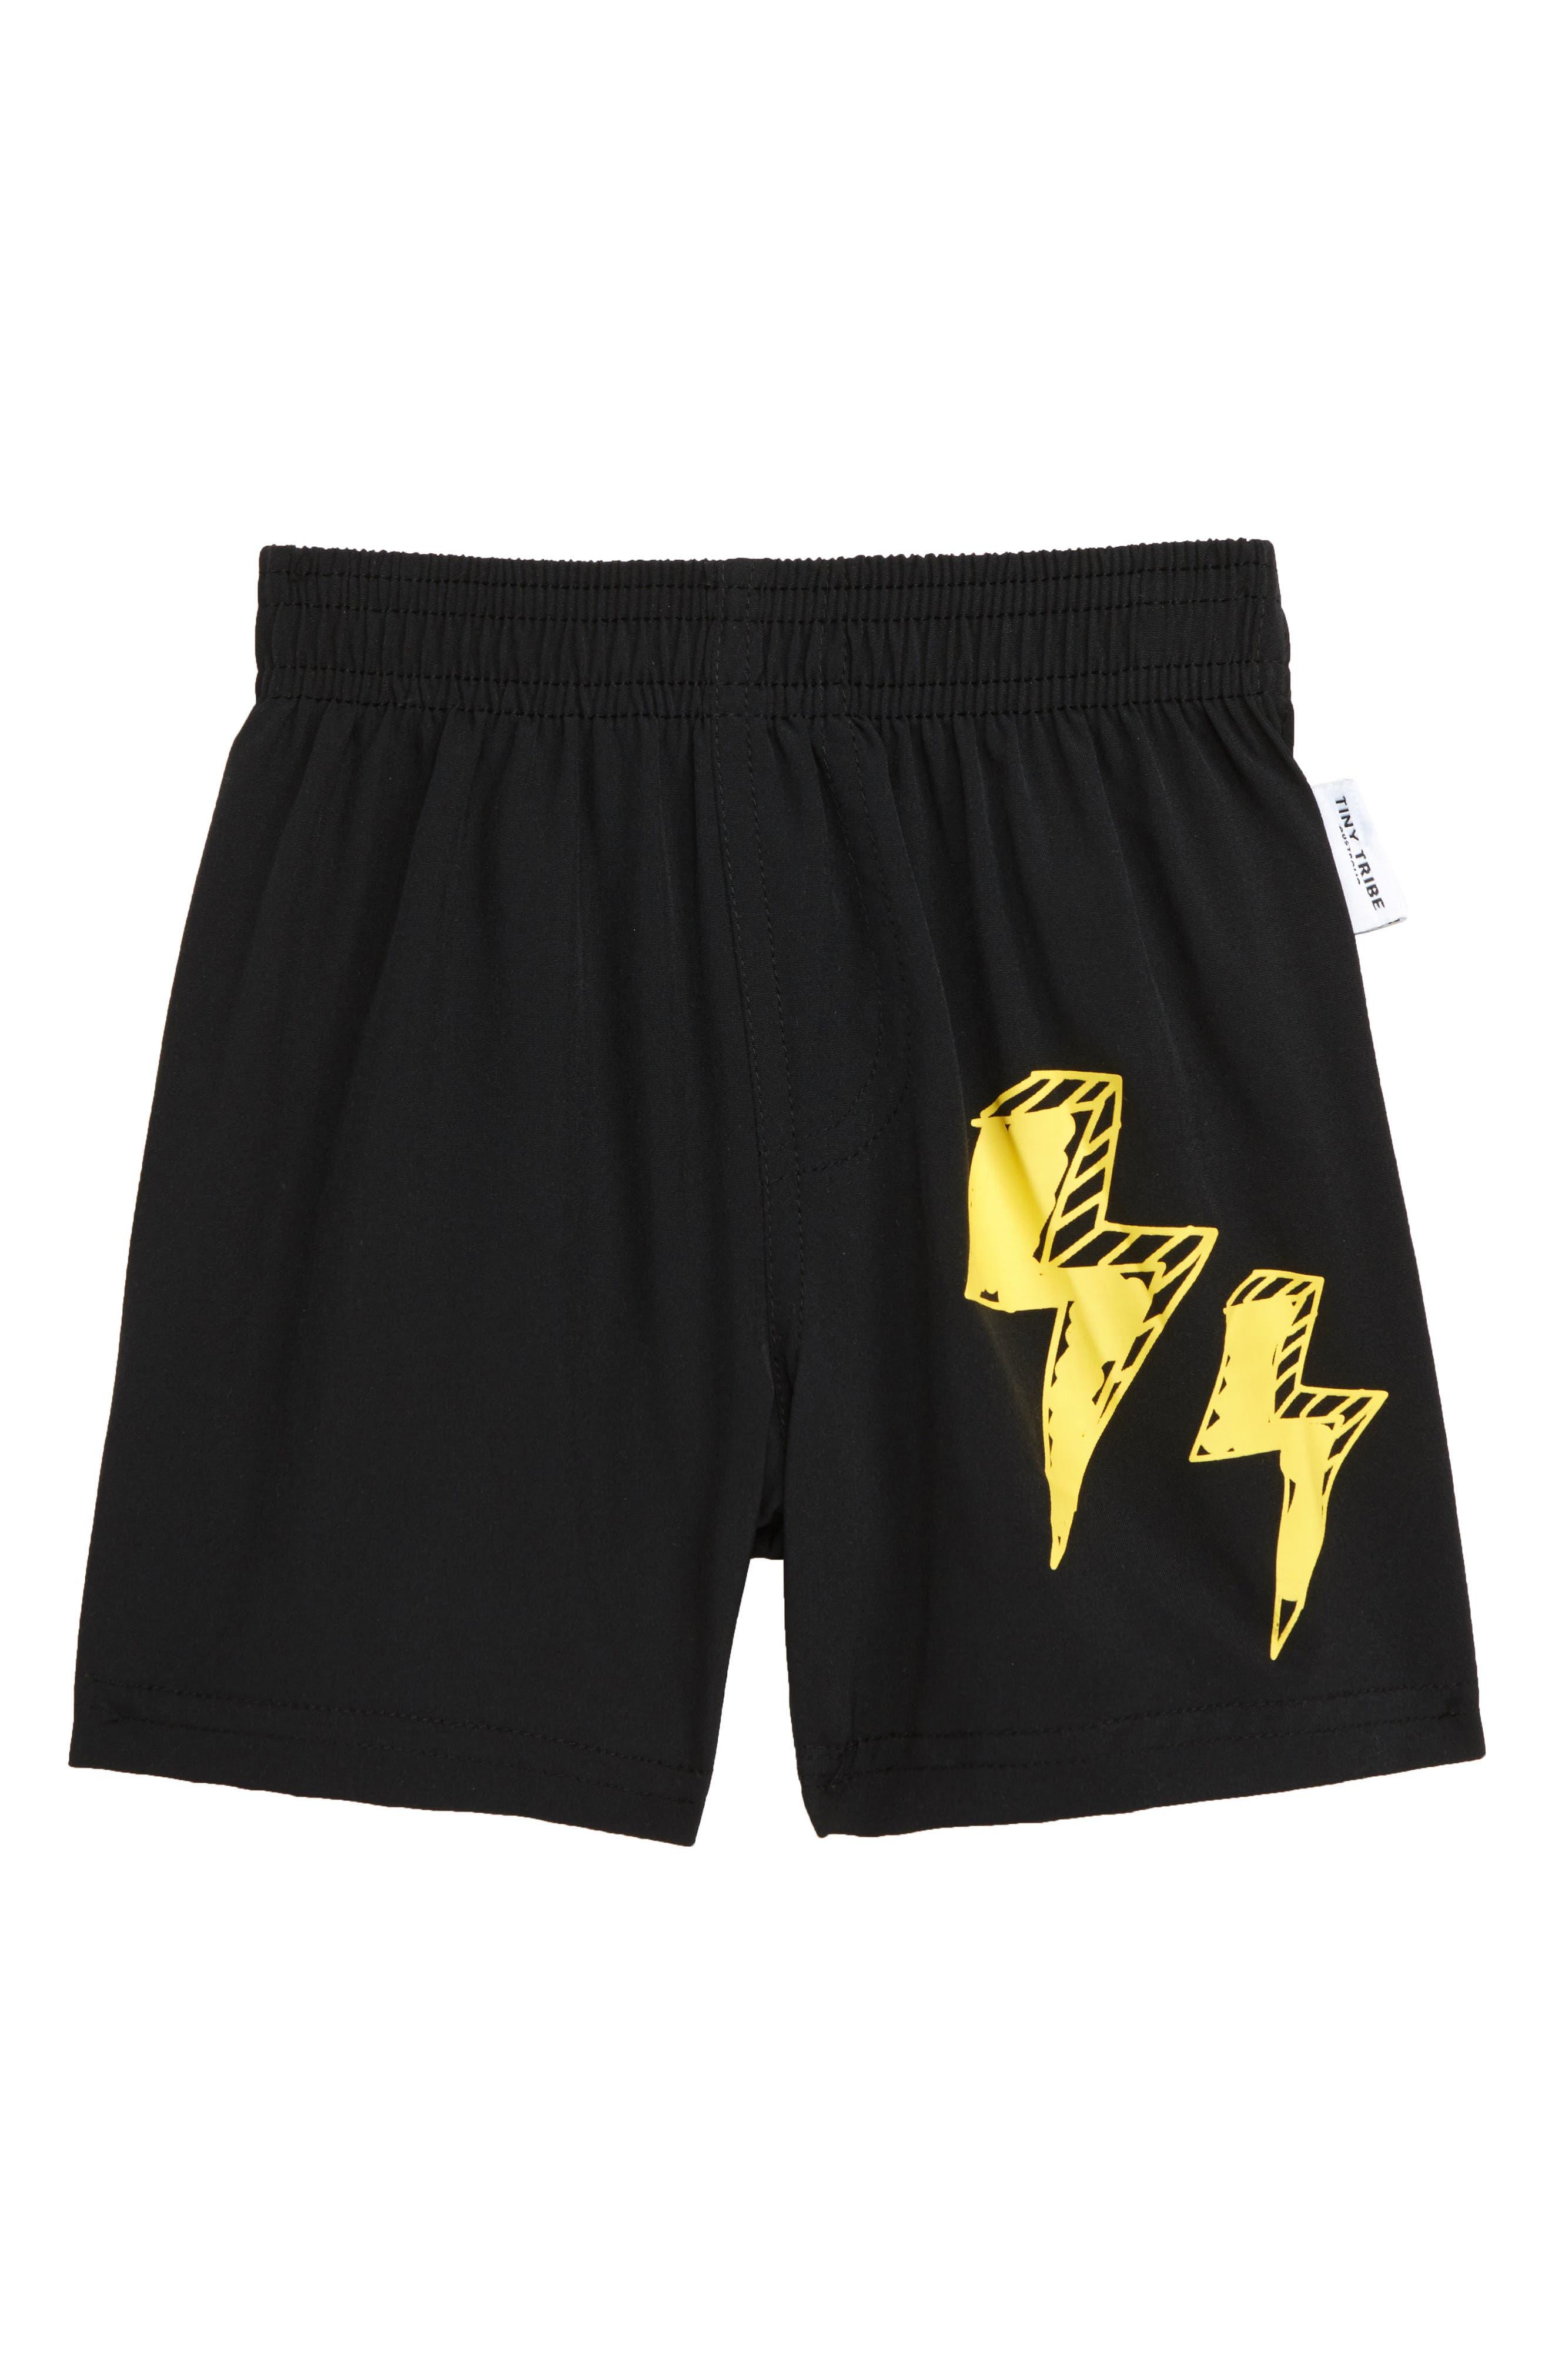 TINY TRIBE Lightning Board Shorts, Main, color, BLACK